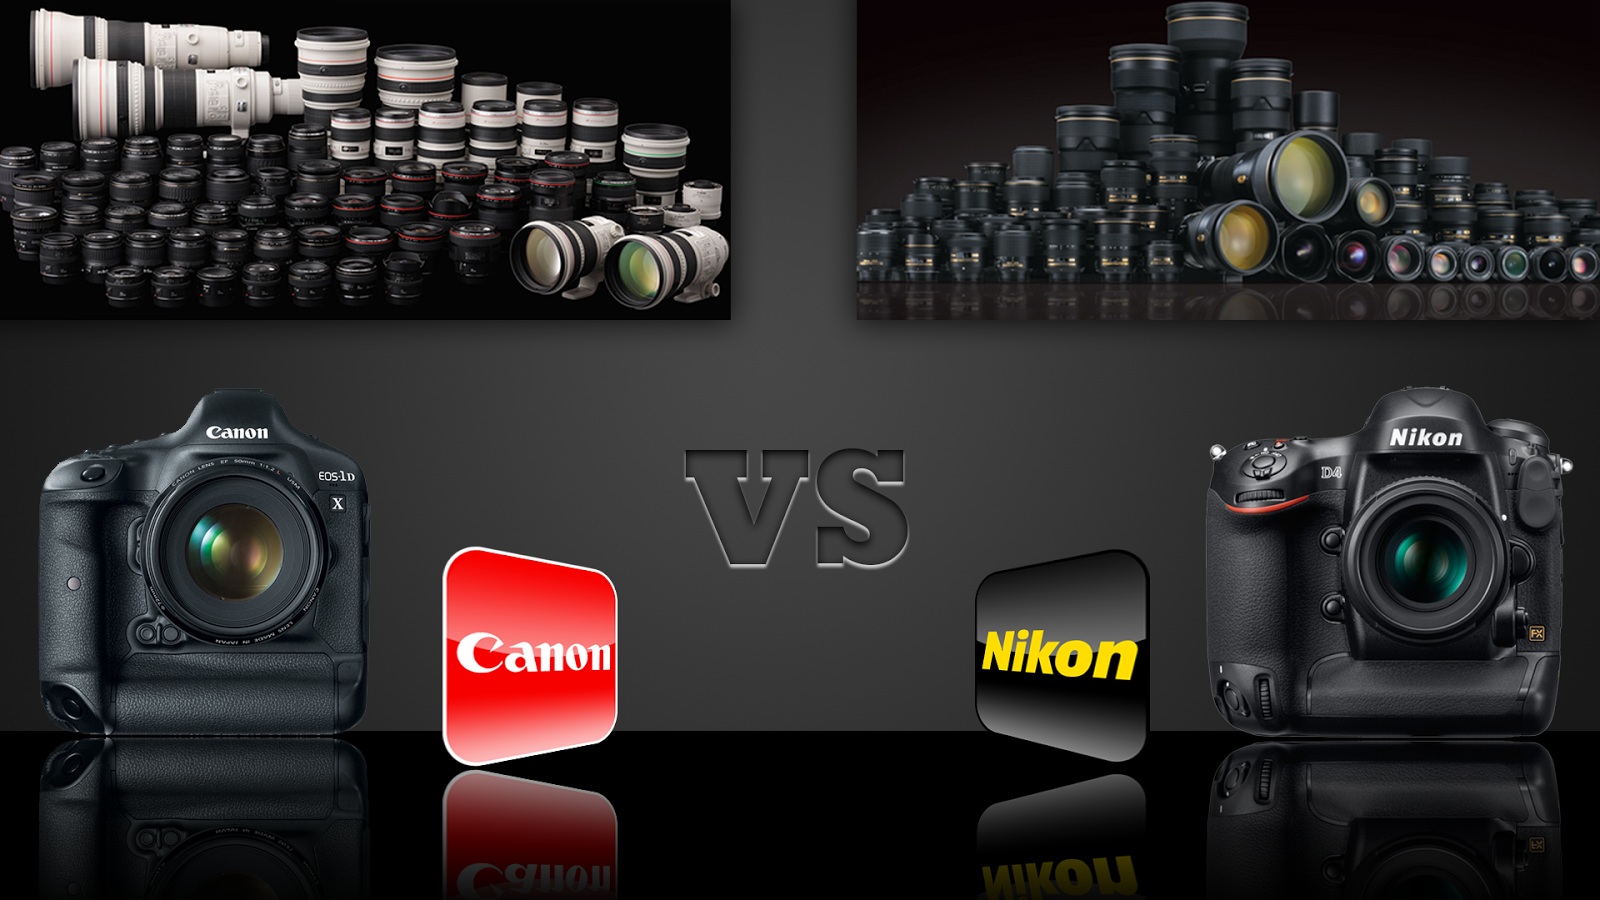 Camera Slr Camera Vs Dslr Camera digital camera and gadget zone canon vs nikon lens slr